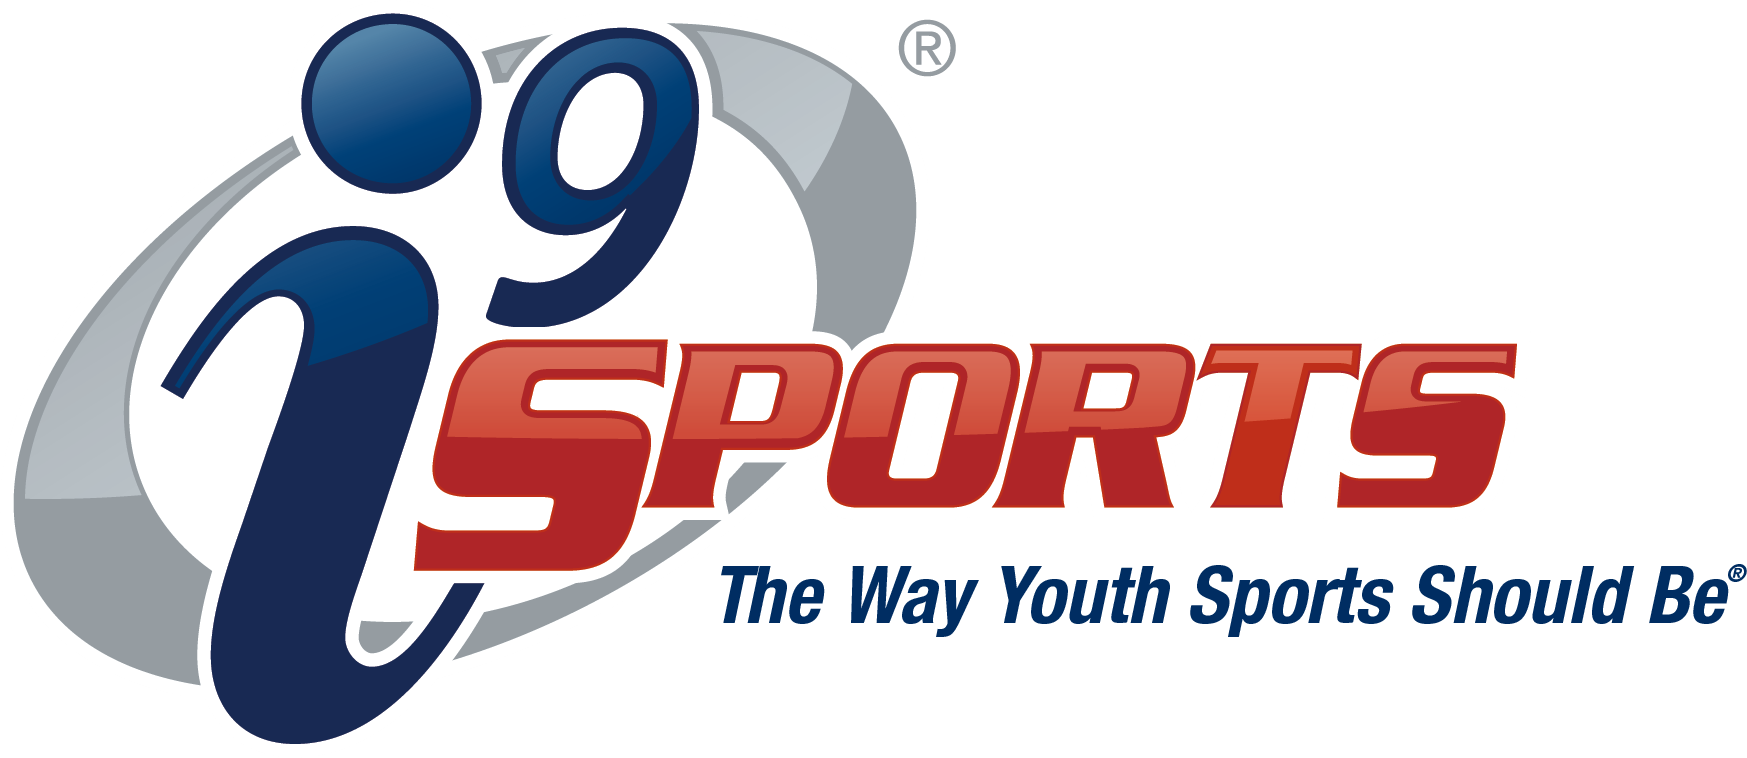 i9 sport.png